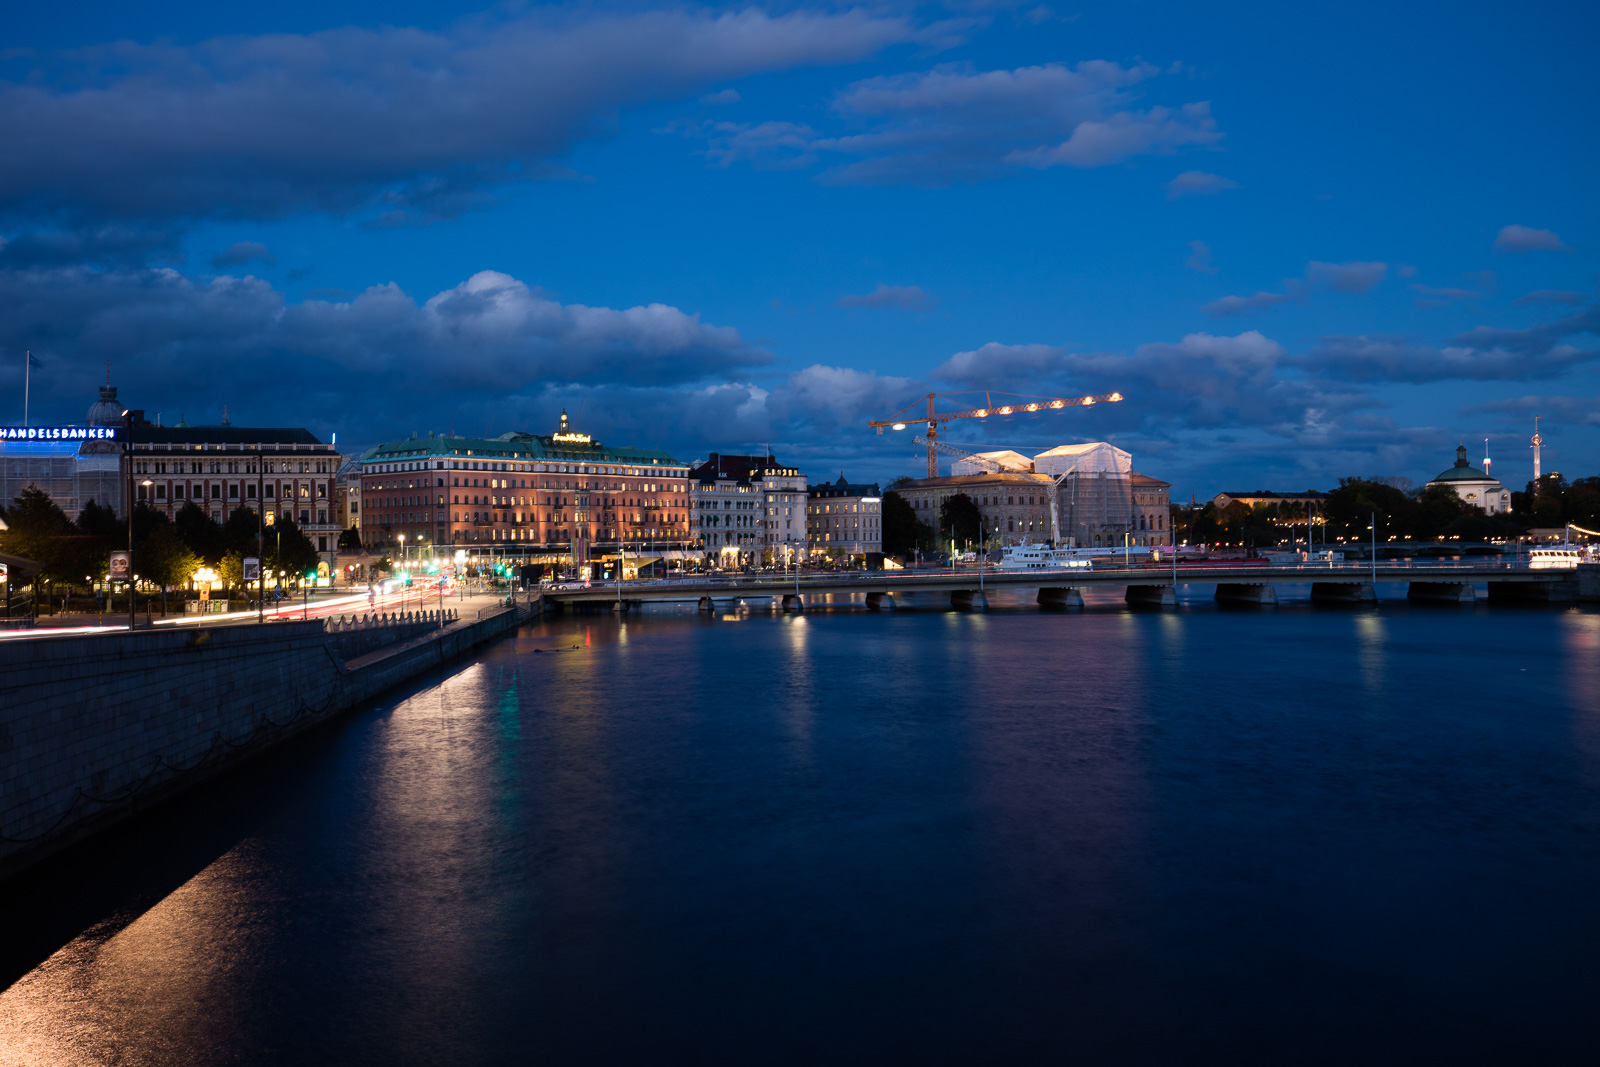 161002-stockholm-462.jpg